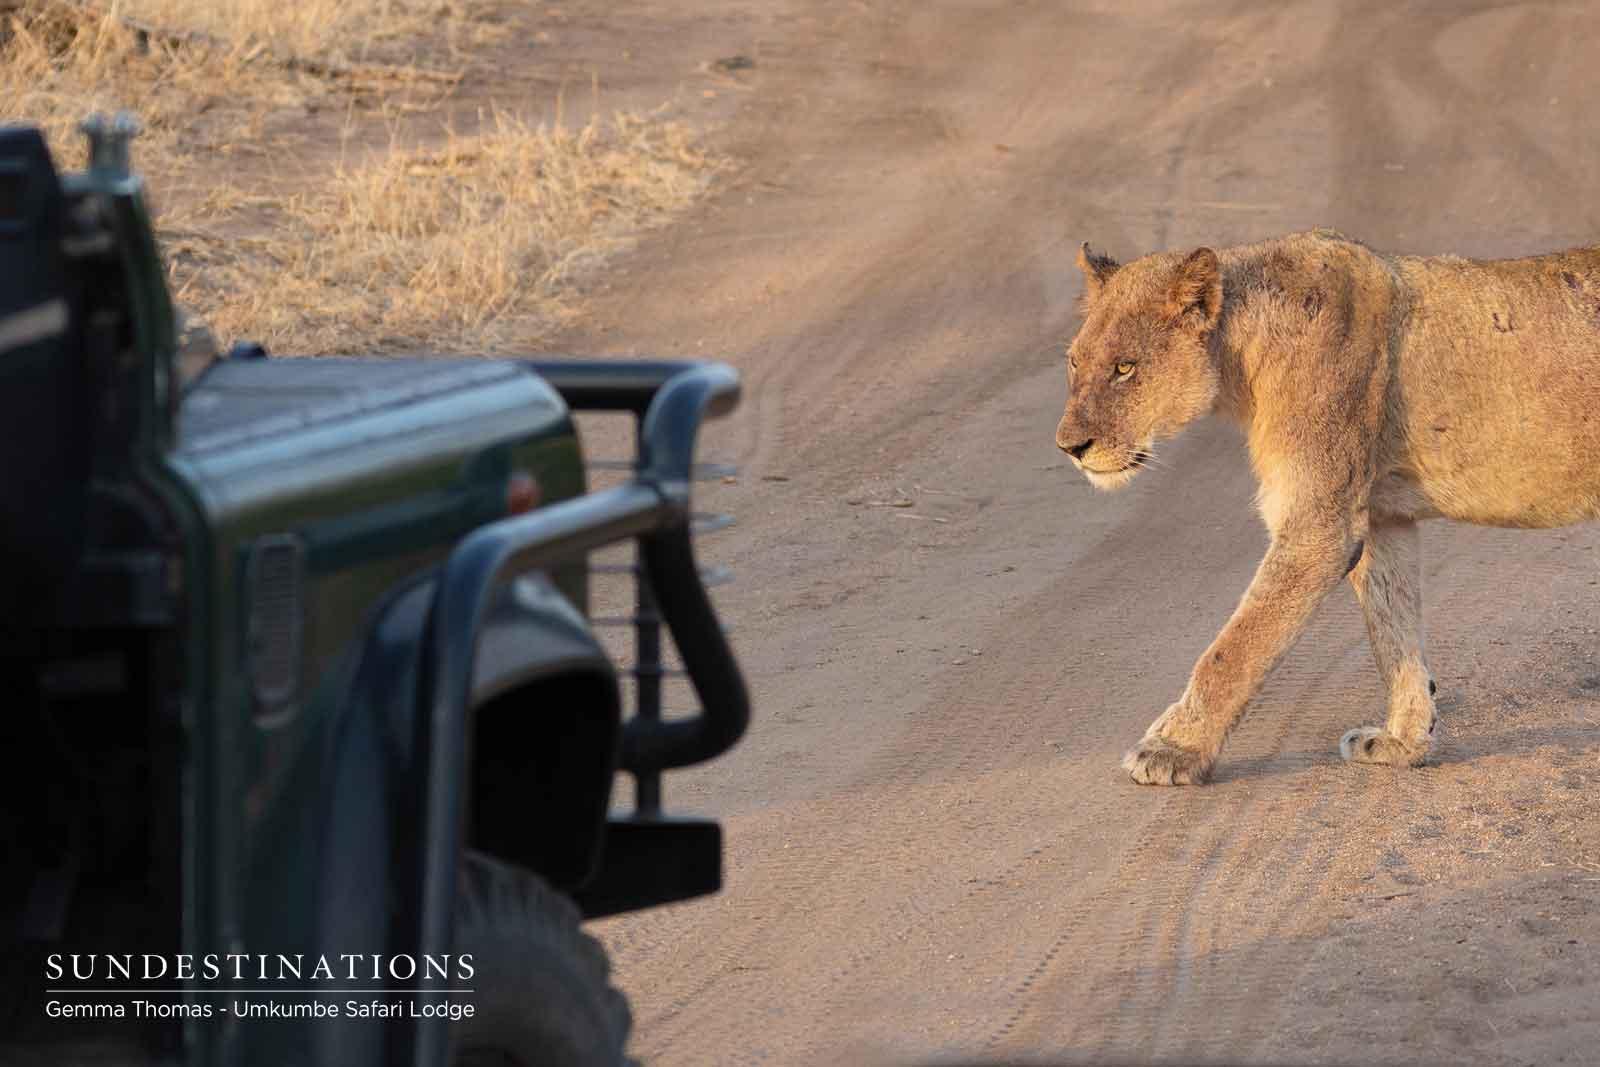 Lions at Umkumbe